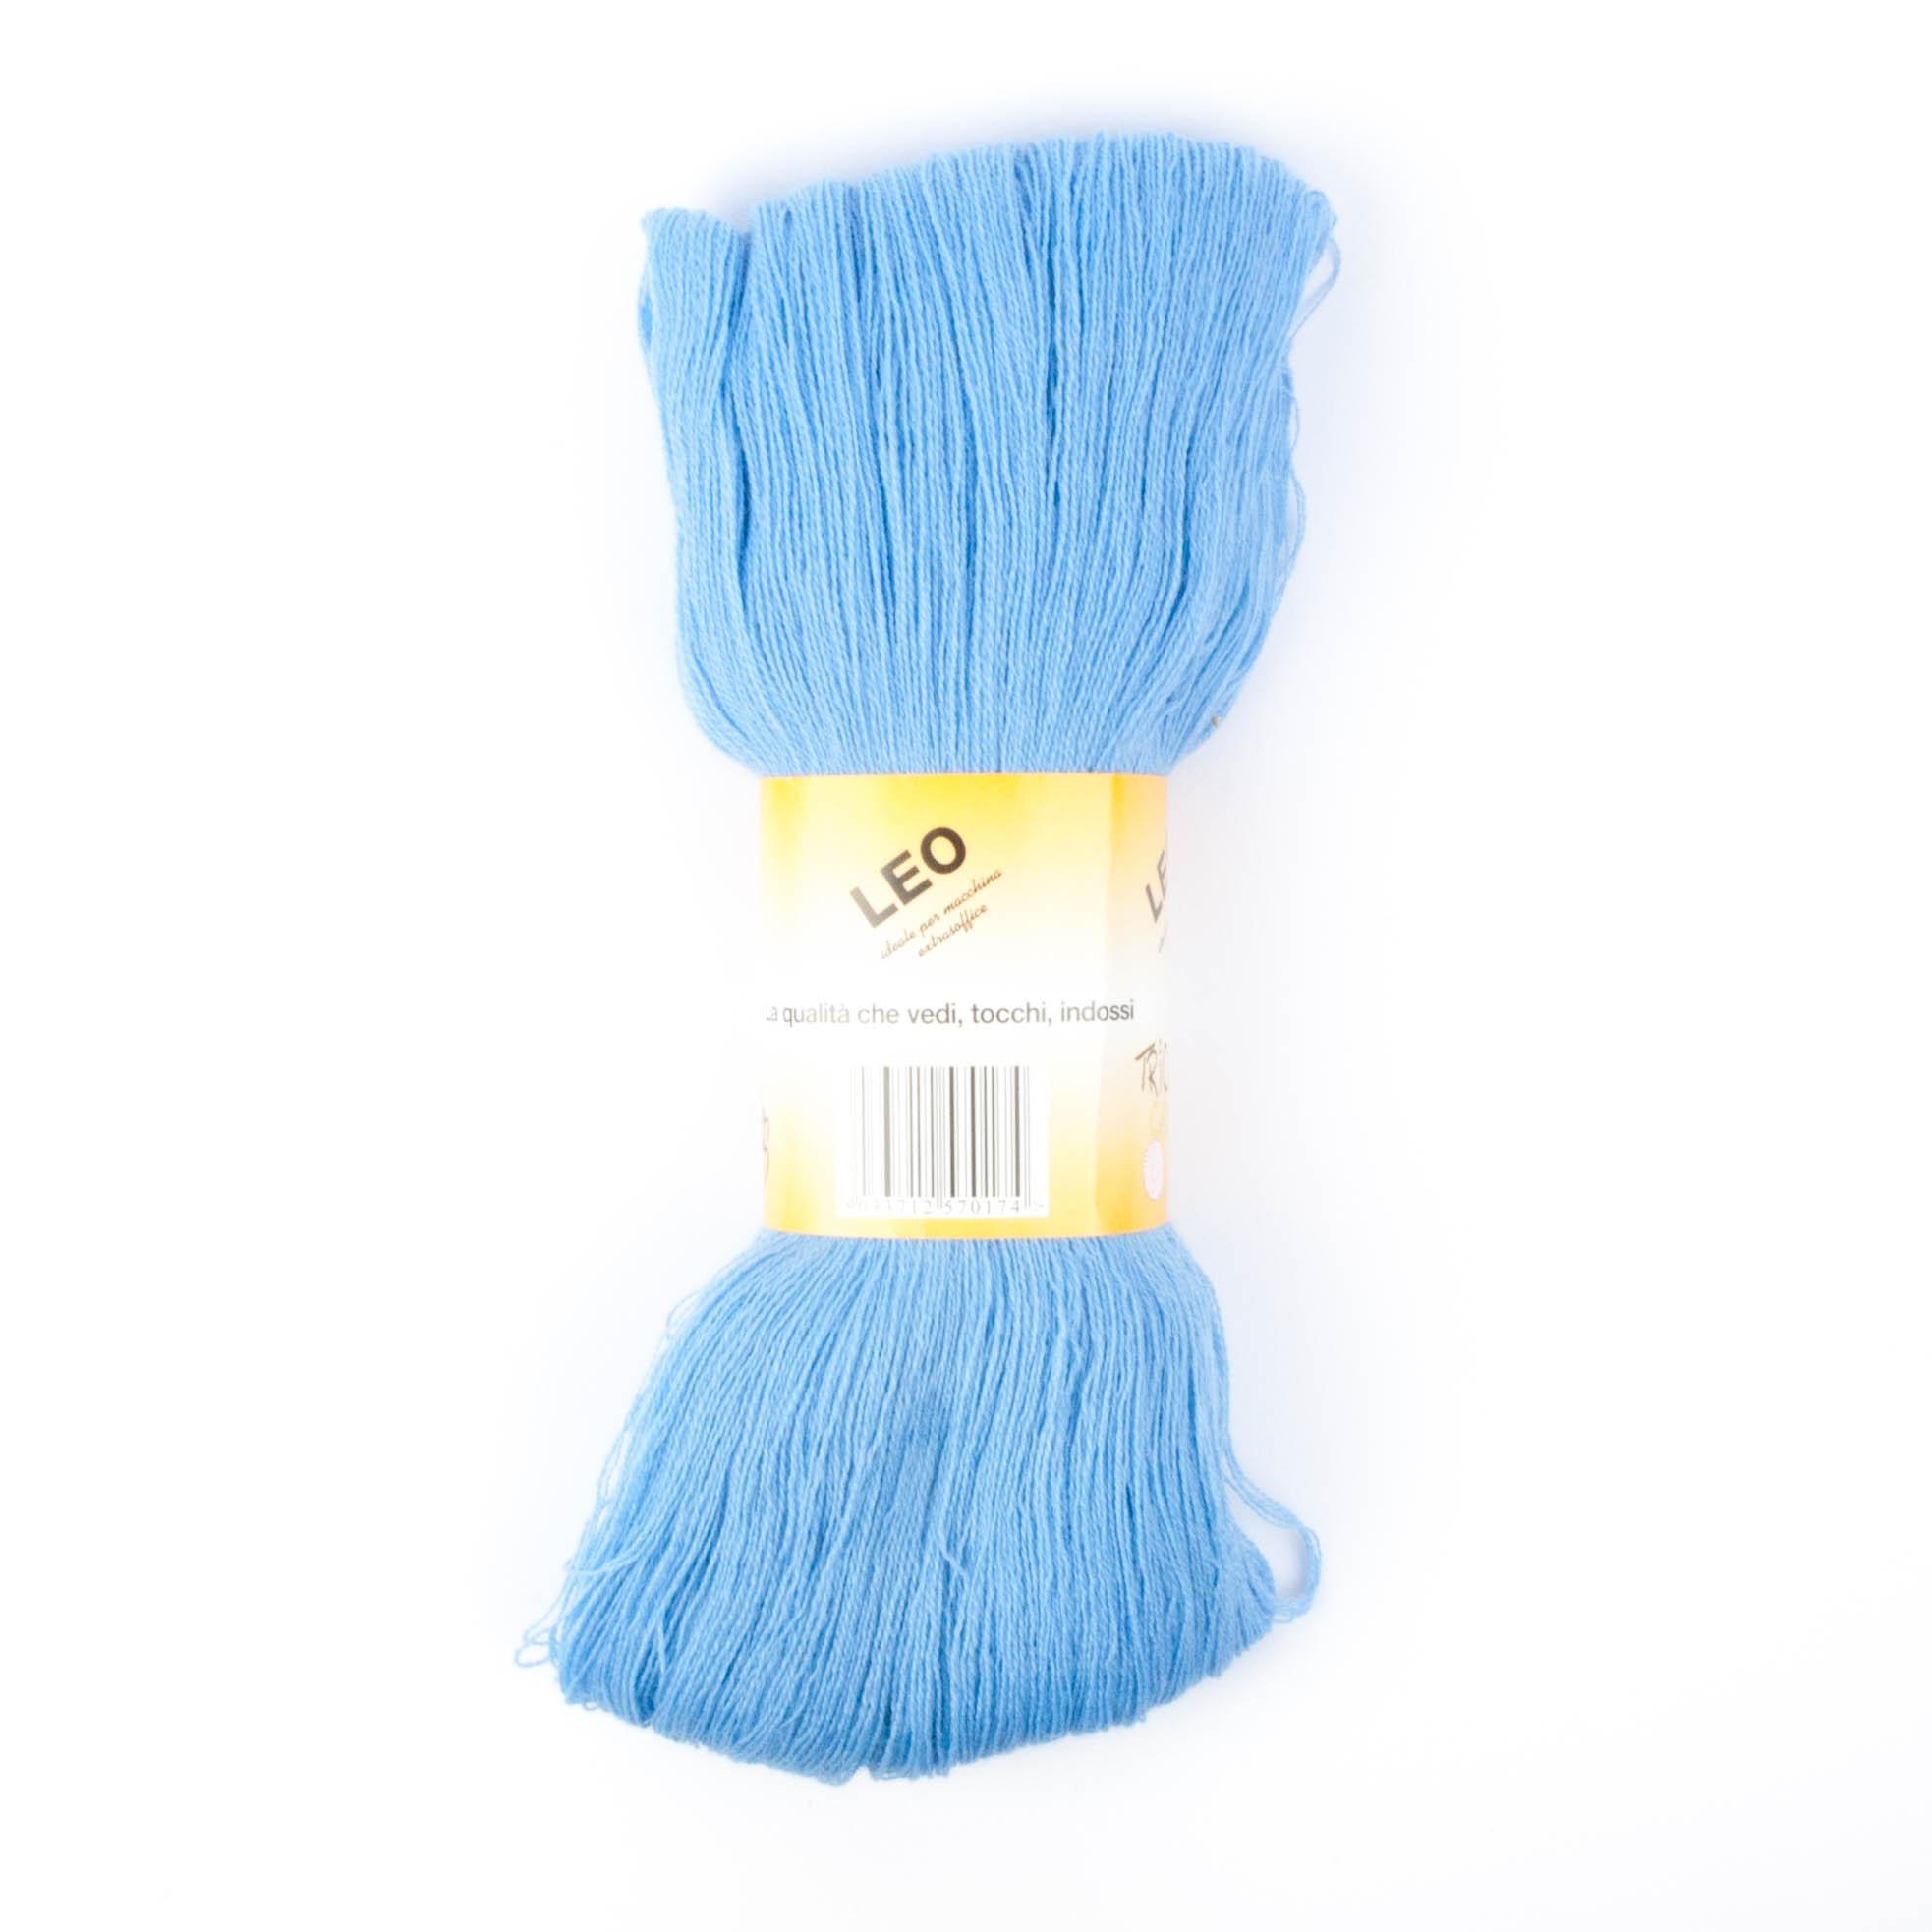 Leo - Matassa misto lana ideale per lavori a mano e macchina - Celeste 21